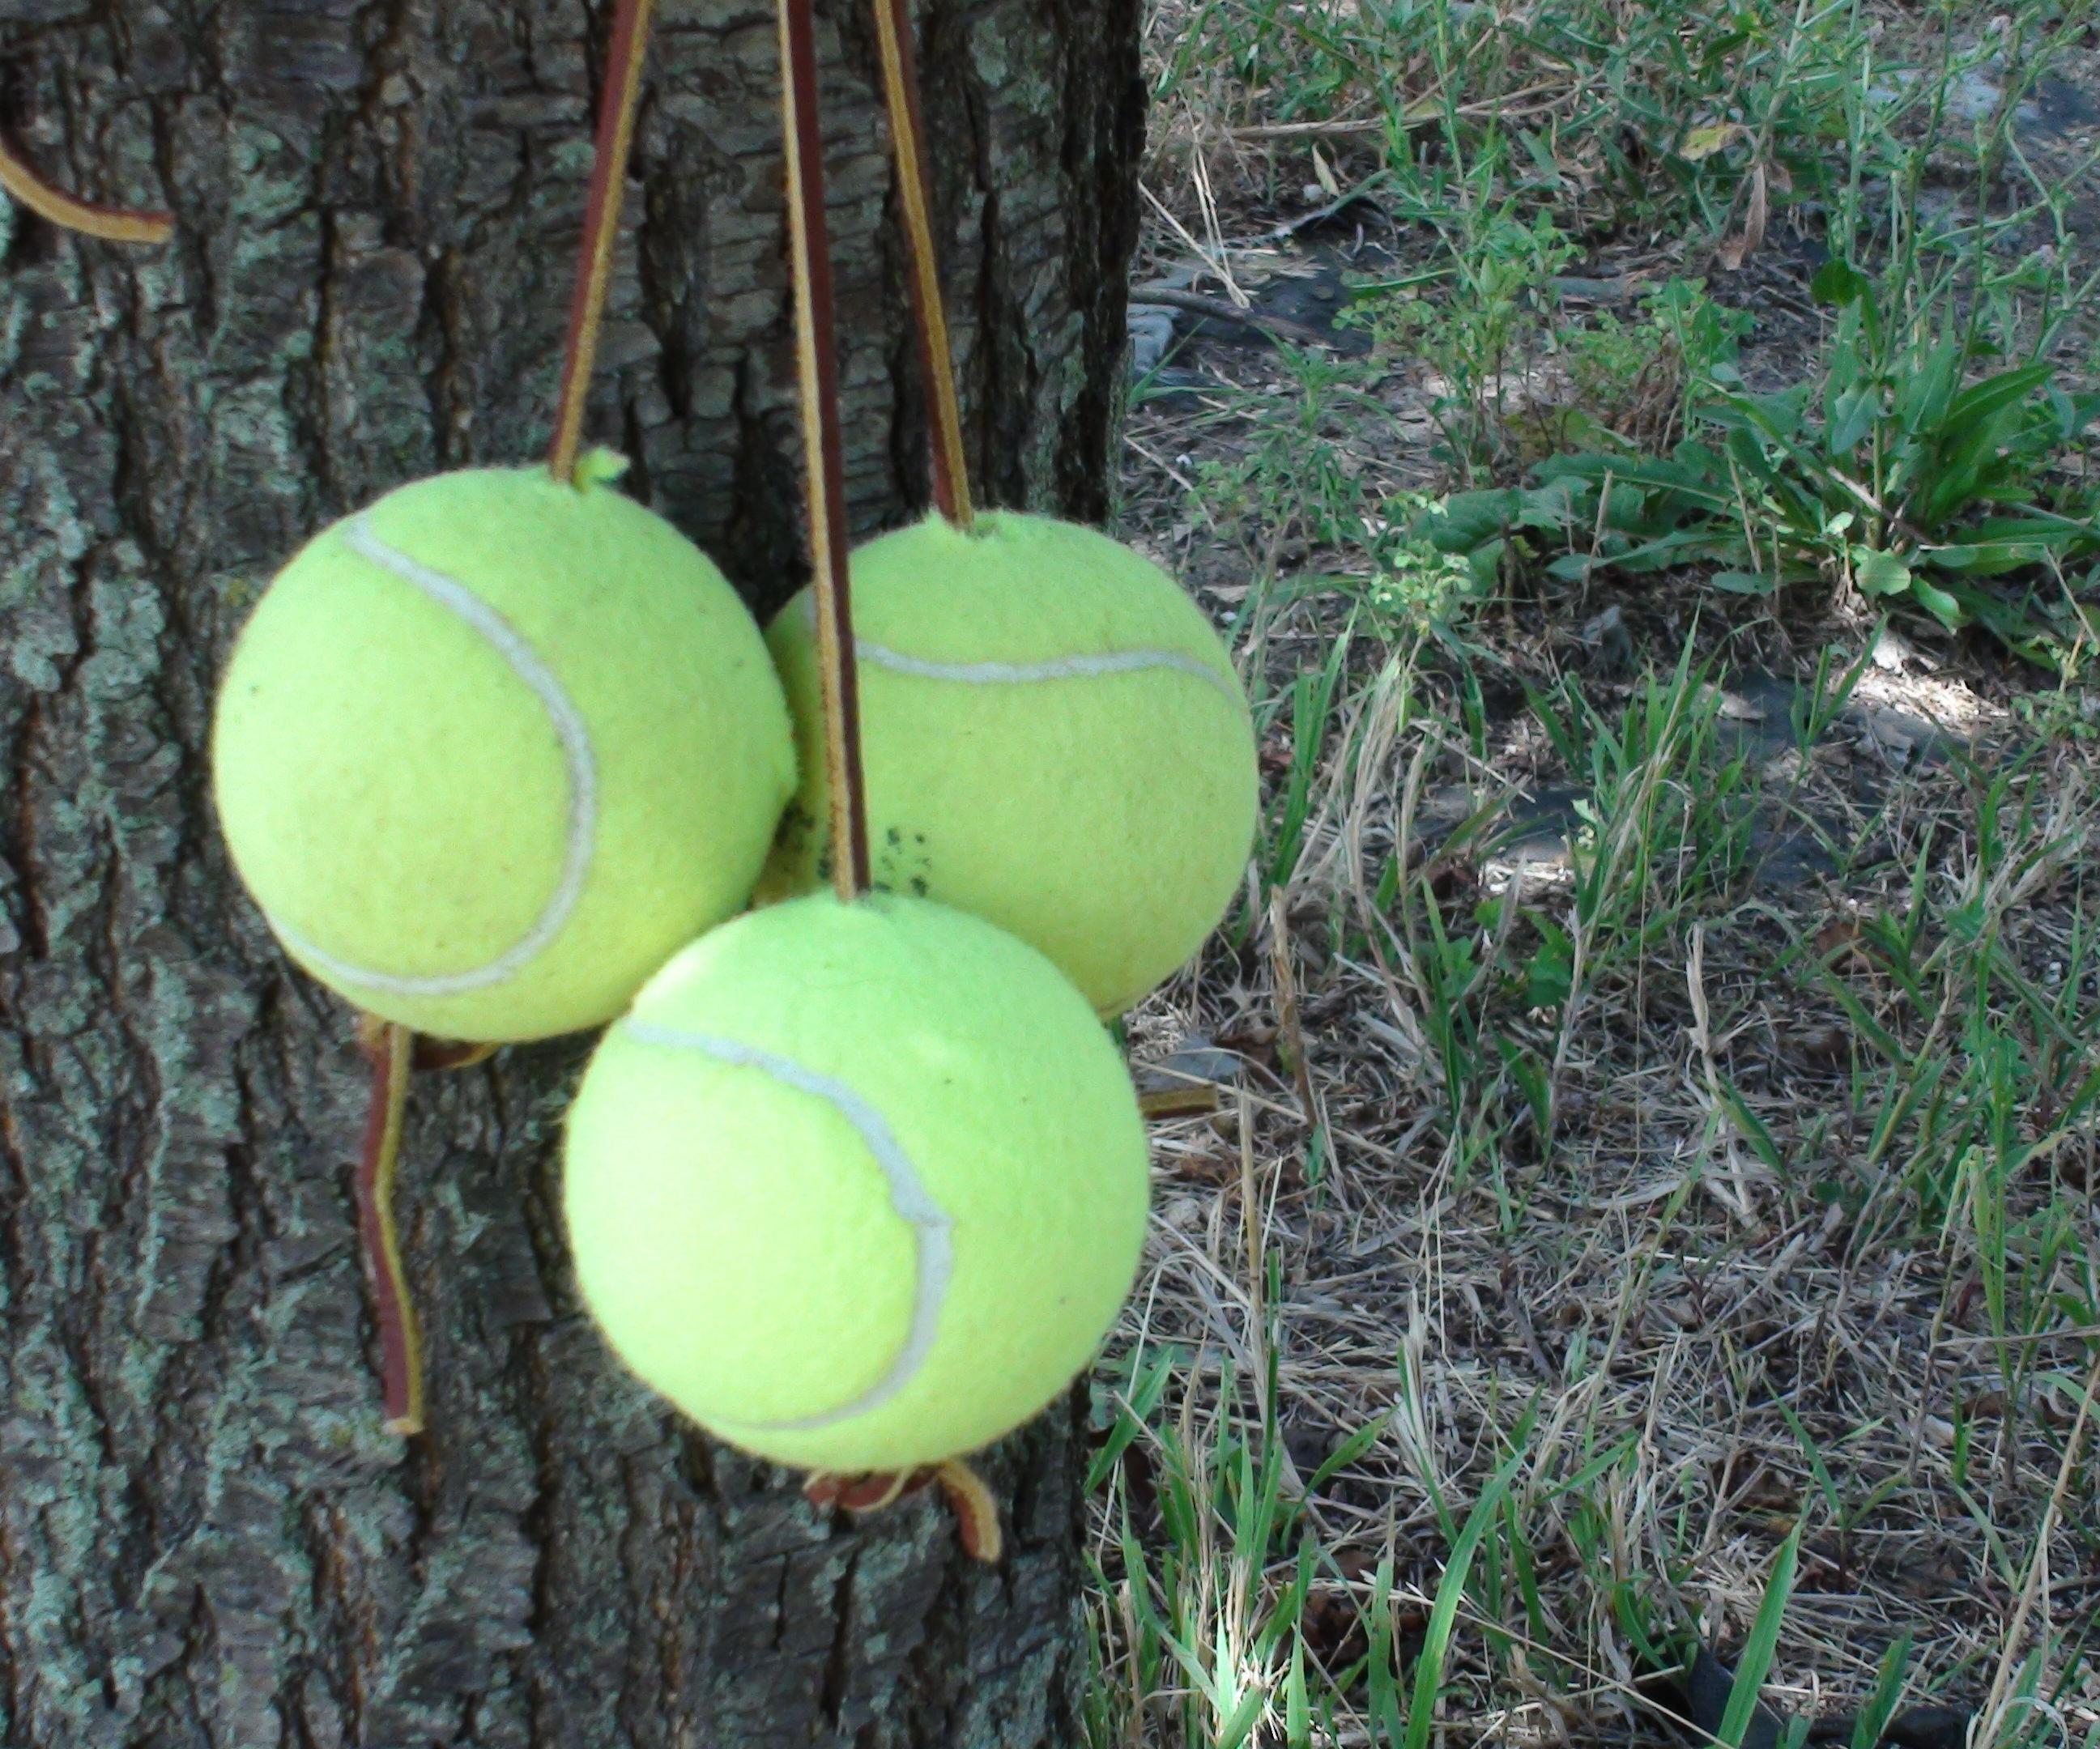 Tennis archery target